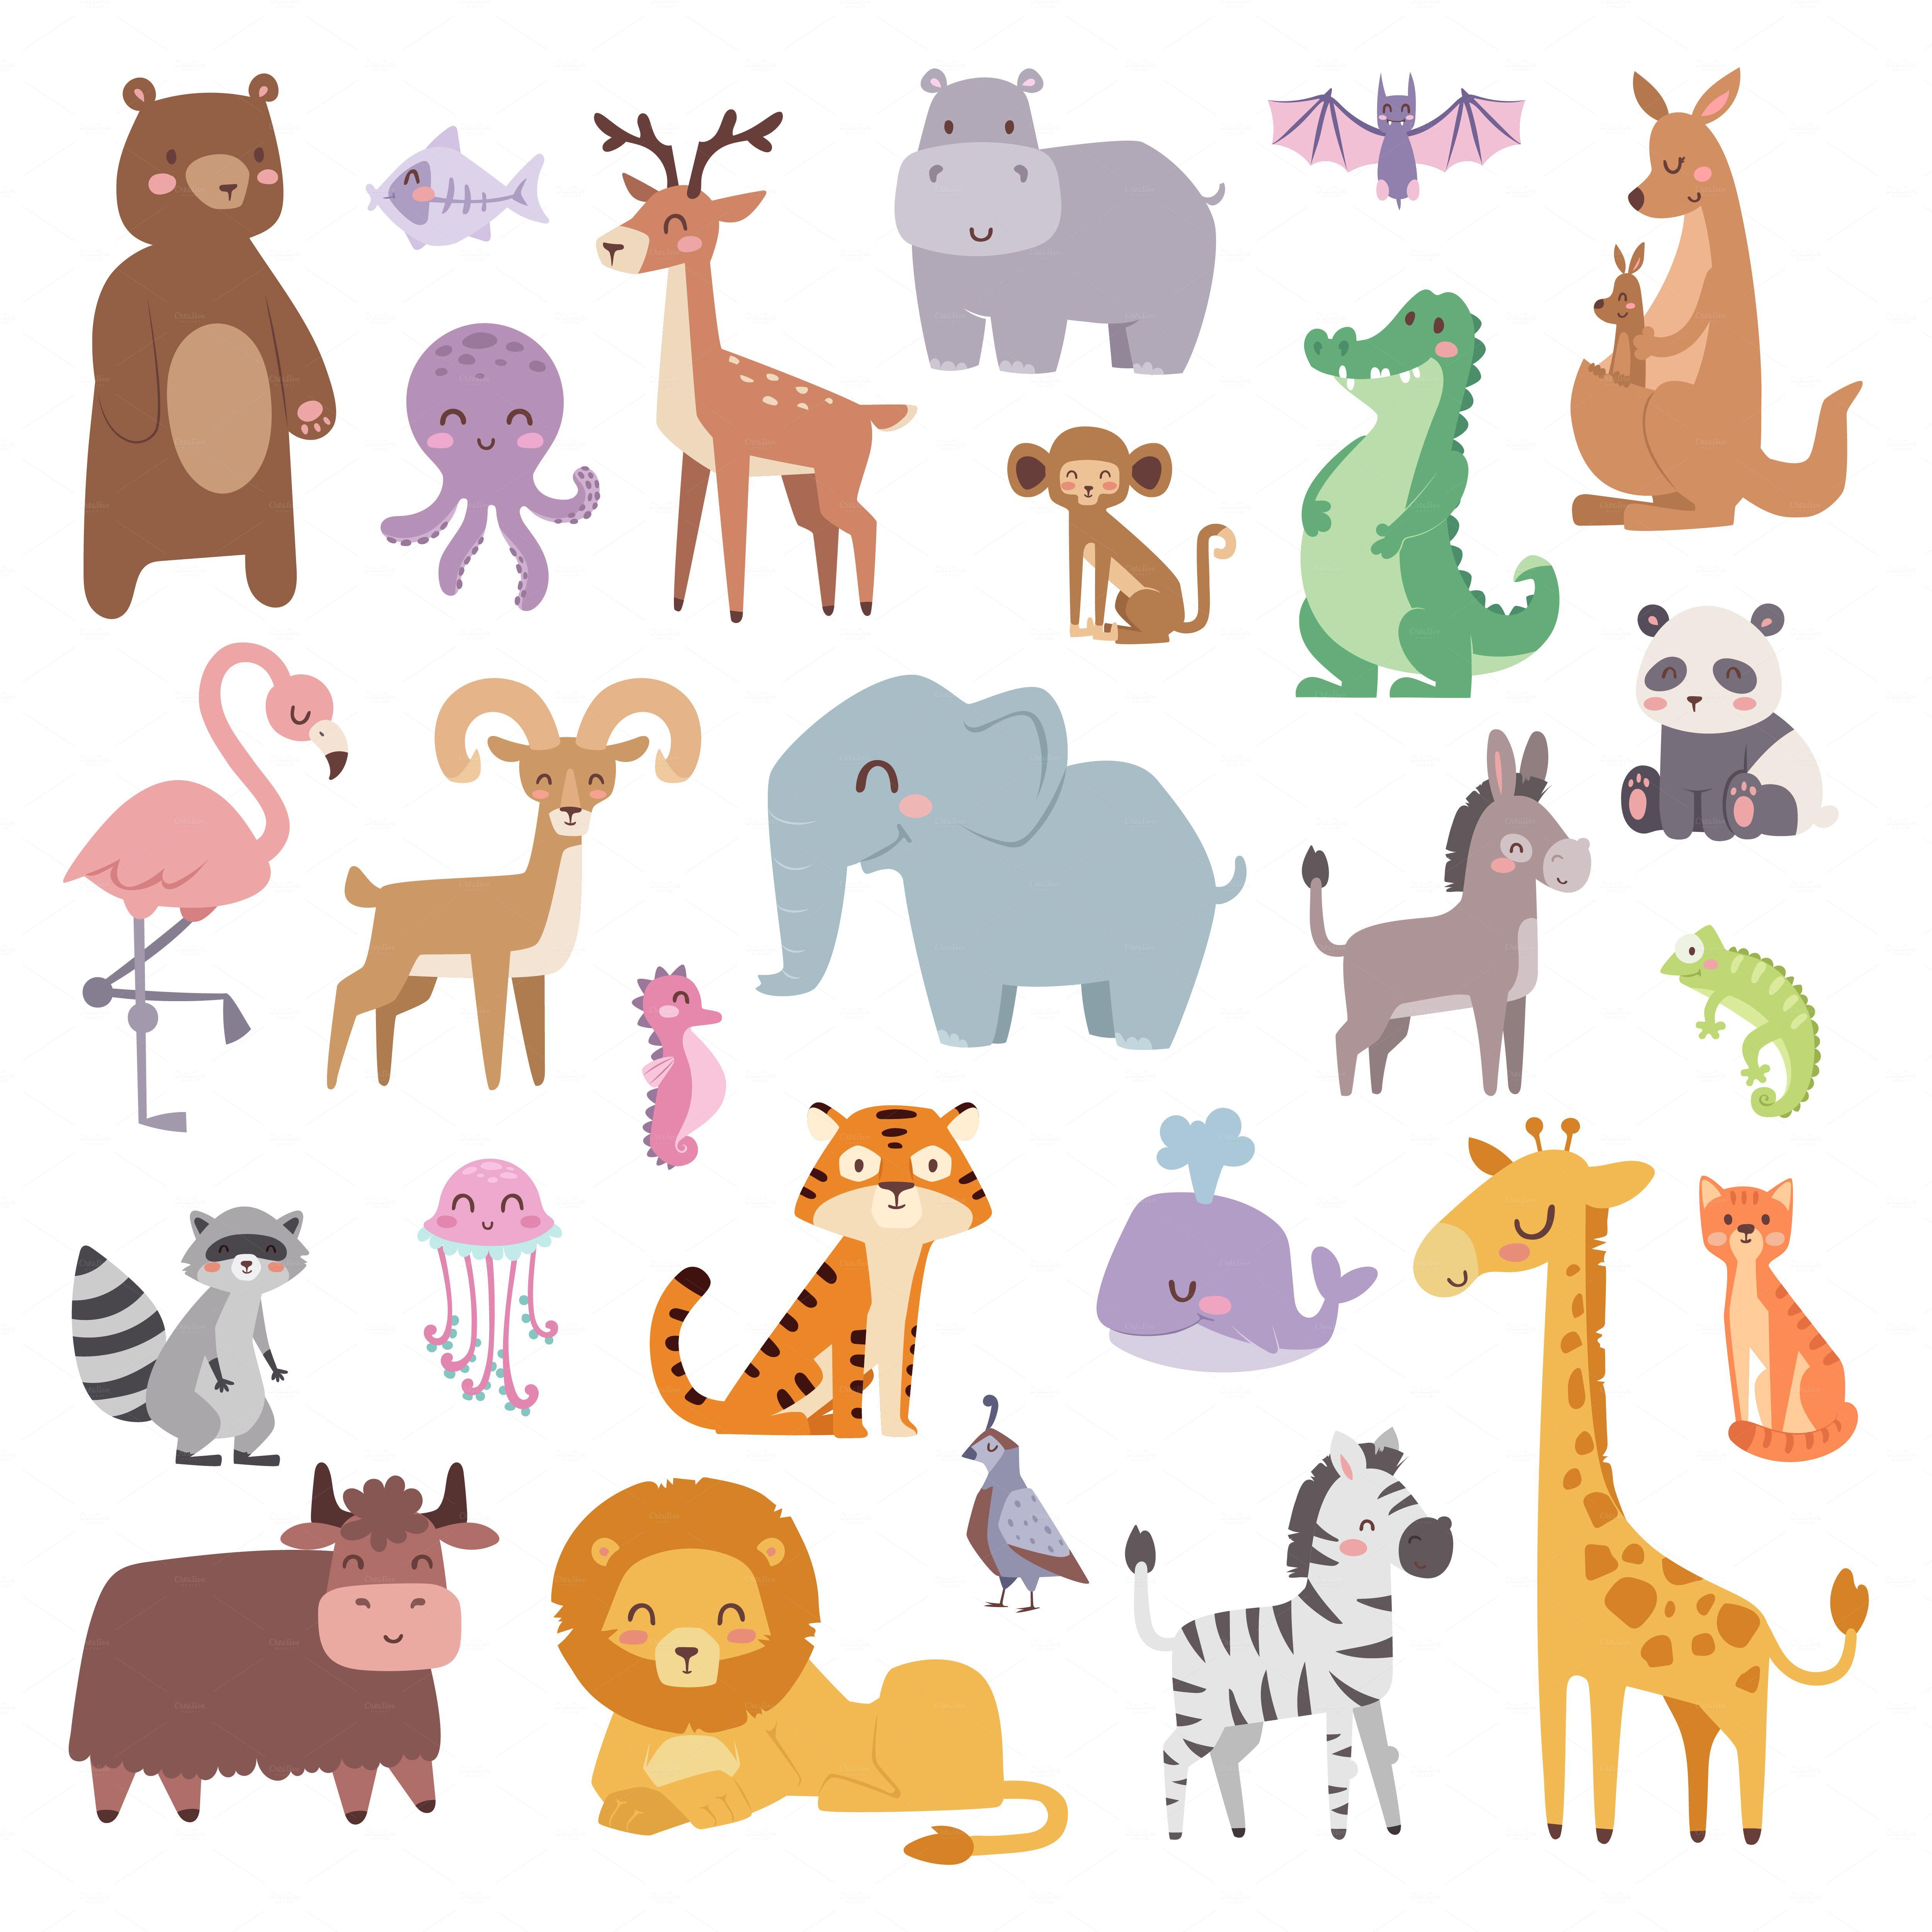 cartoon animals character vector by vectorstockstoker on. Black Bedroom Furniture Sets. Home Design Ideas